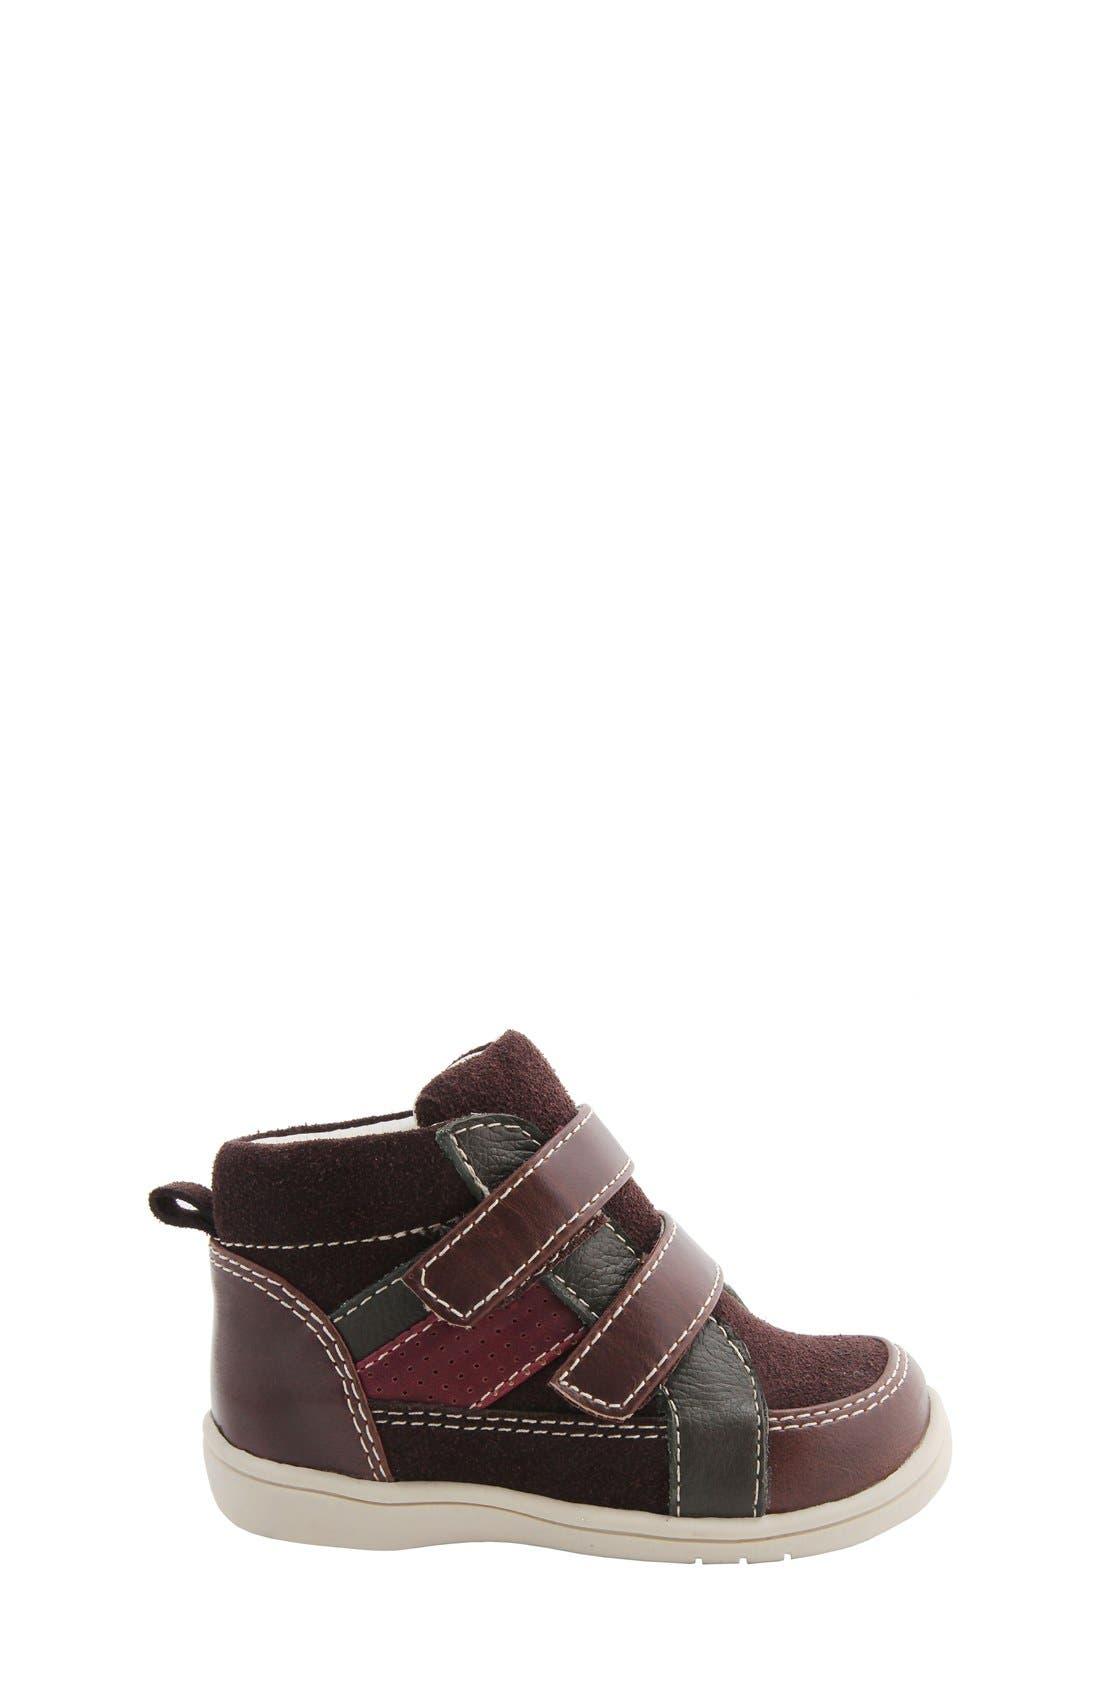 Nina 'Cairo' High Top Sneaker,                             Alternate thumbnail 6, color,                             Brown Suede